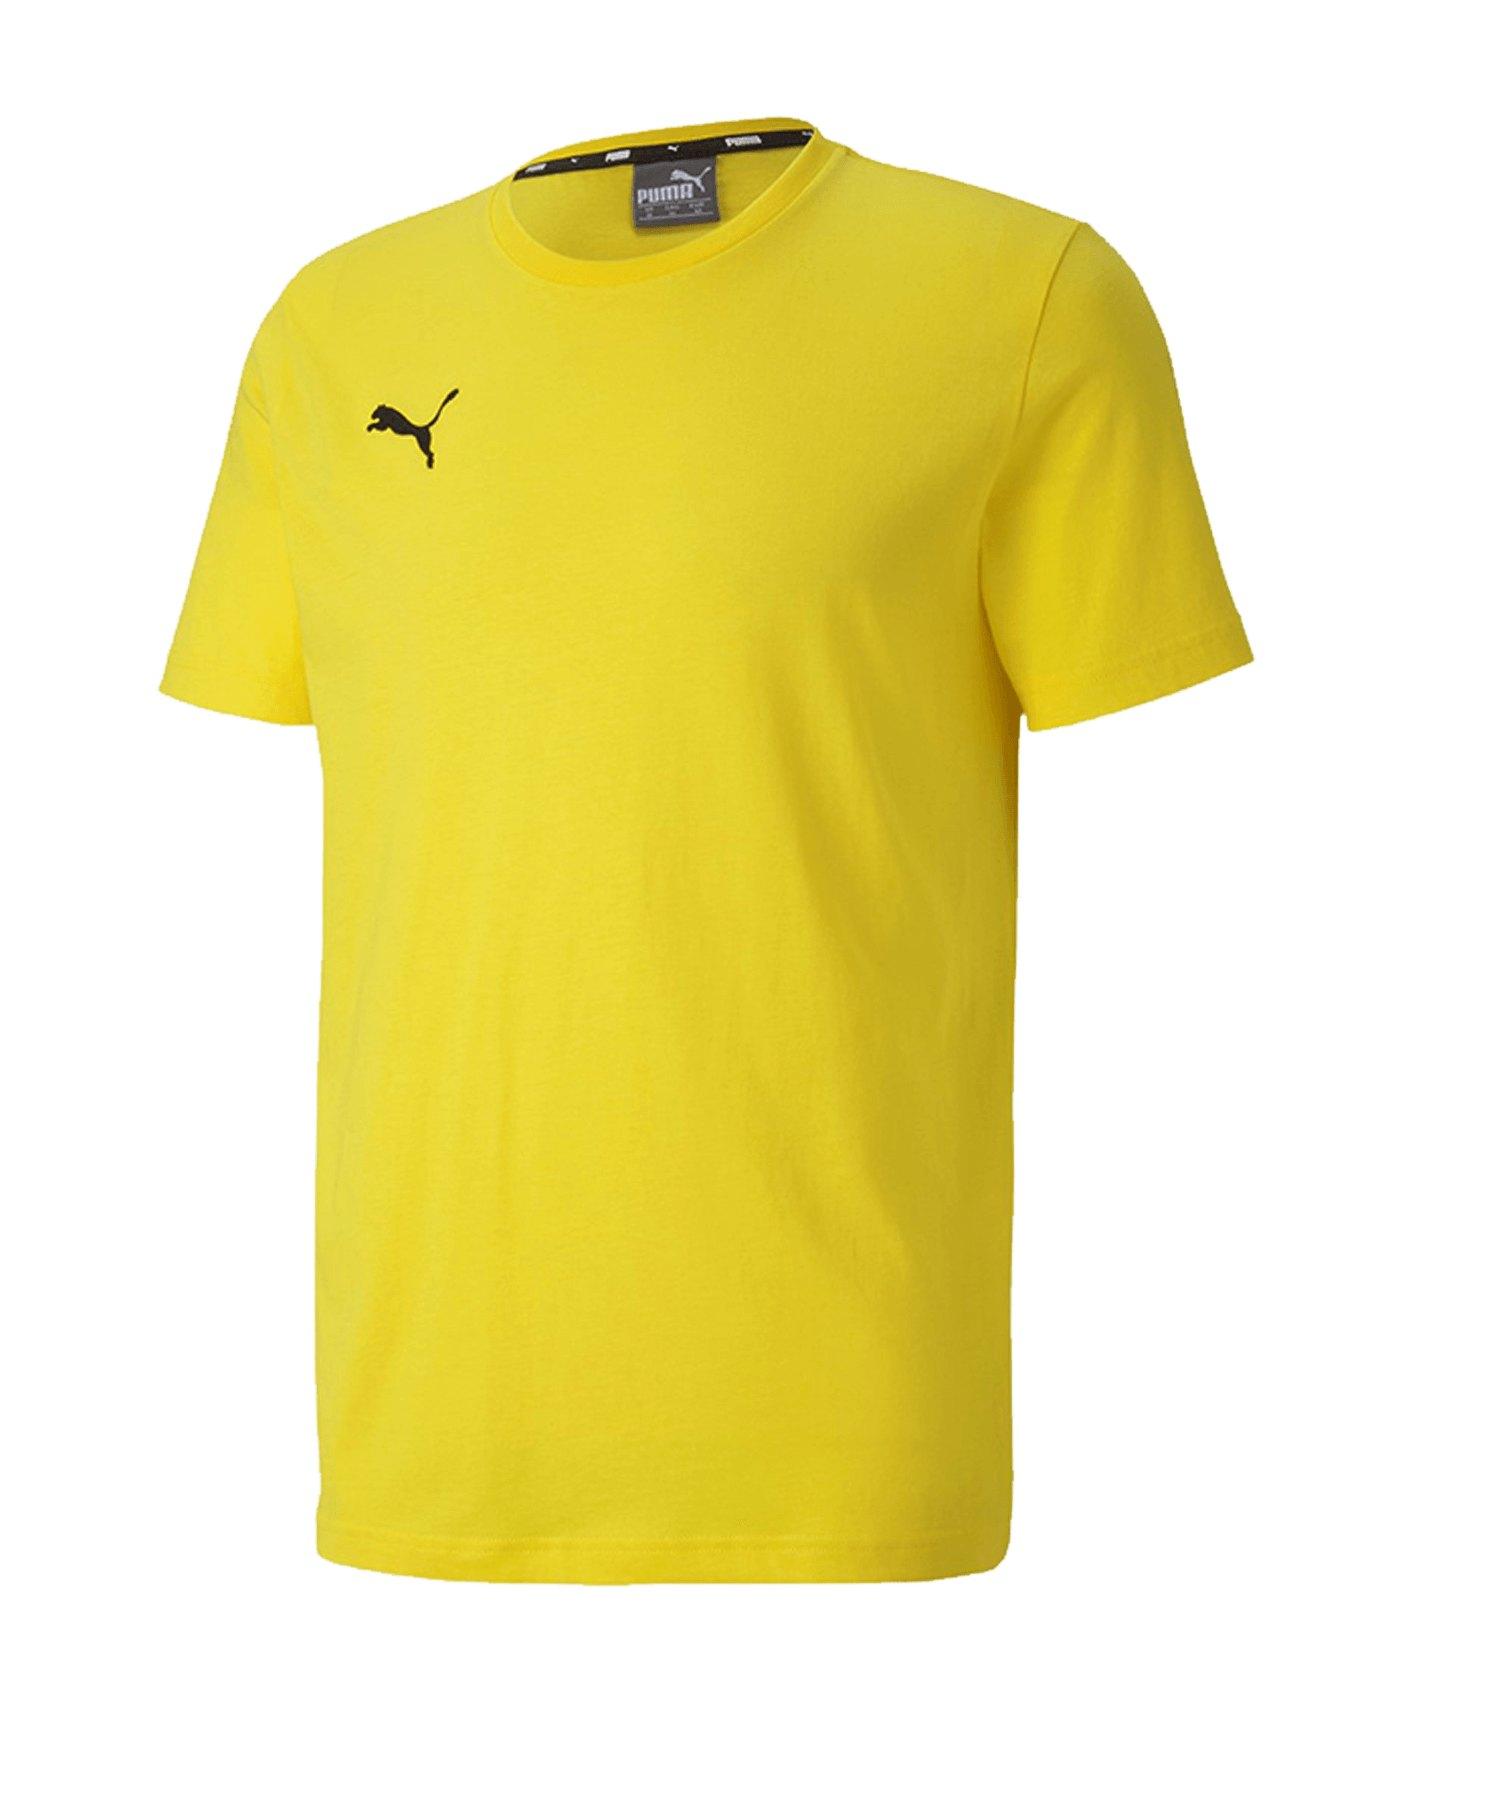 PUMA teamGOAL 23 Casuals Tee T-Shirt Gelb F07 - gelb